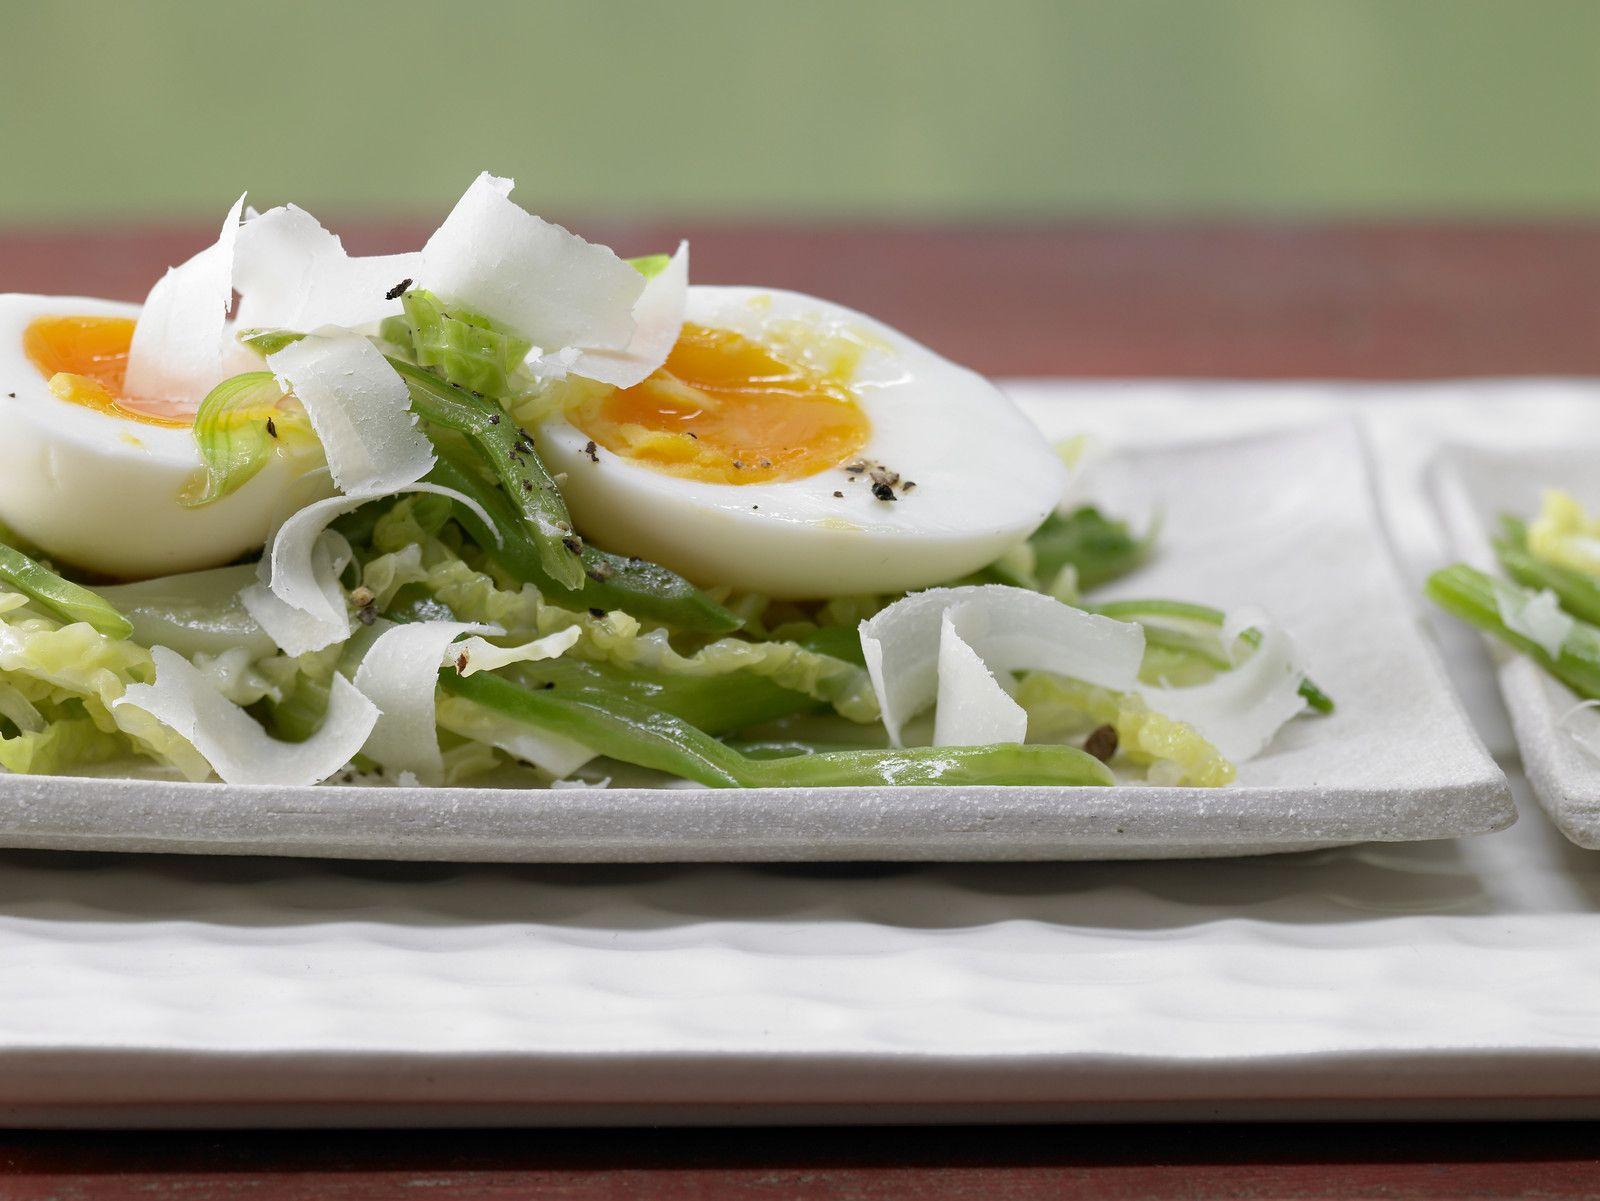 Wachsweiche eier rezept - Eier weich kochen zeit ...